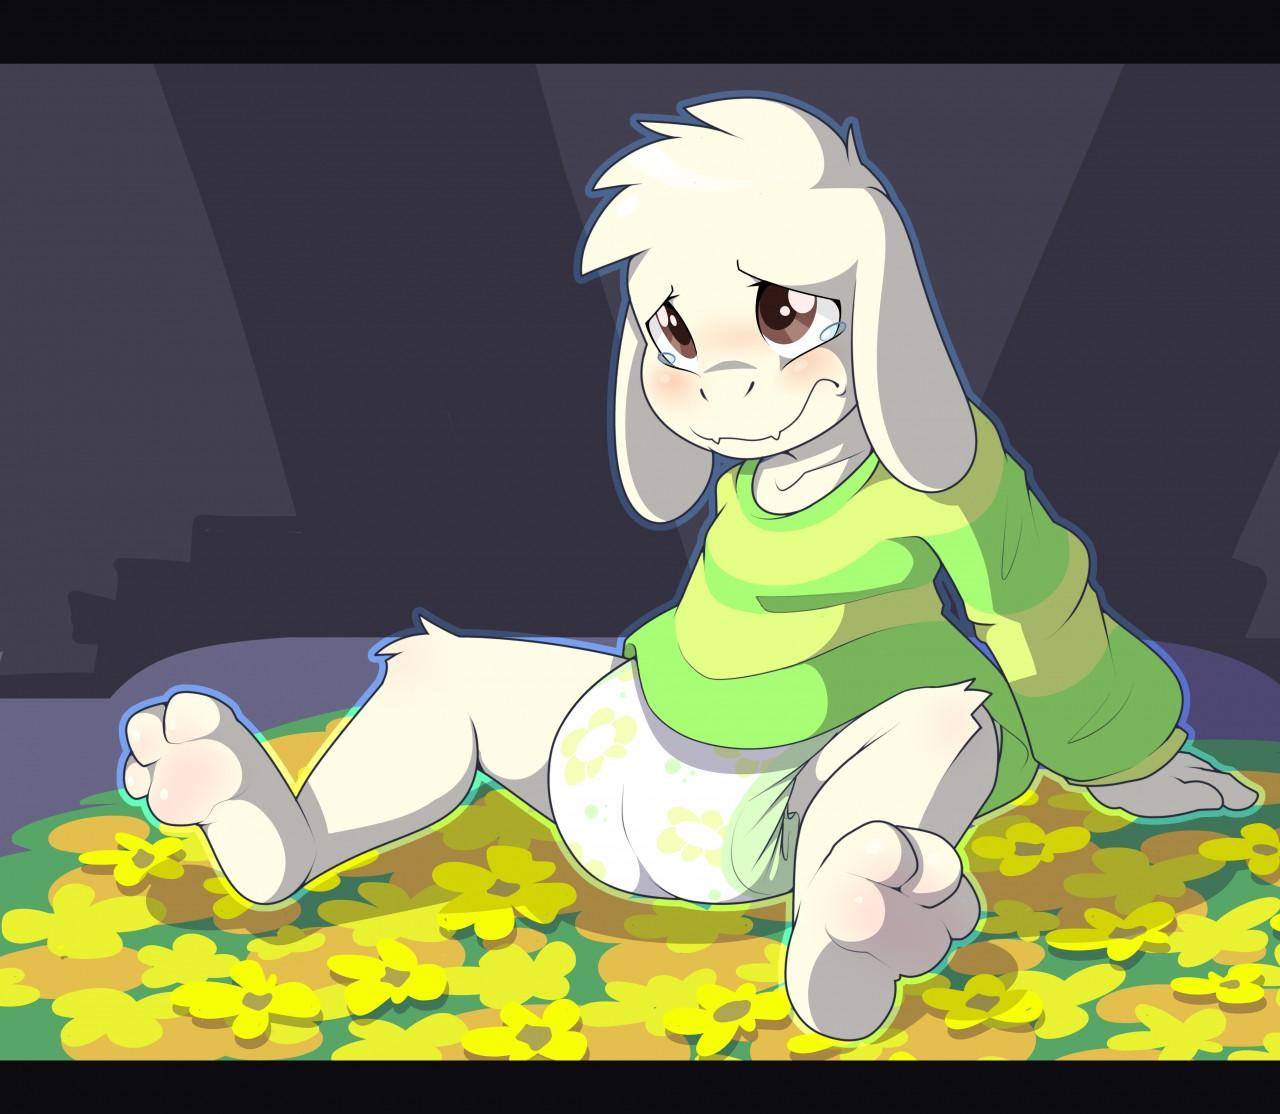 Undertale Diaper Cartoon Green Yellow Mammal Vertebrate Fictional Character